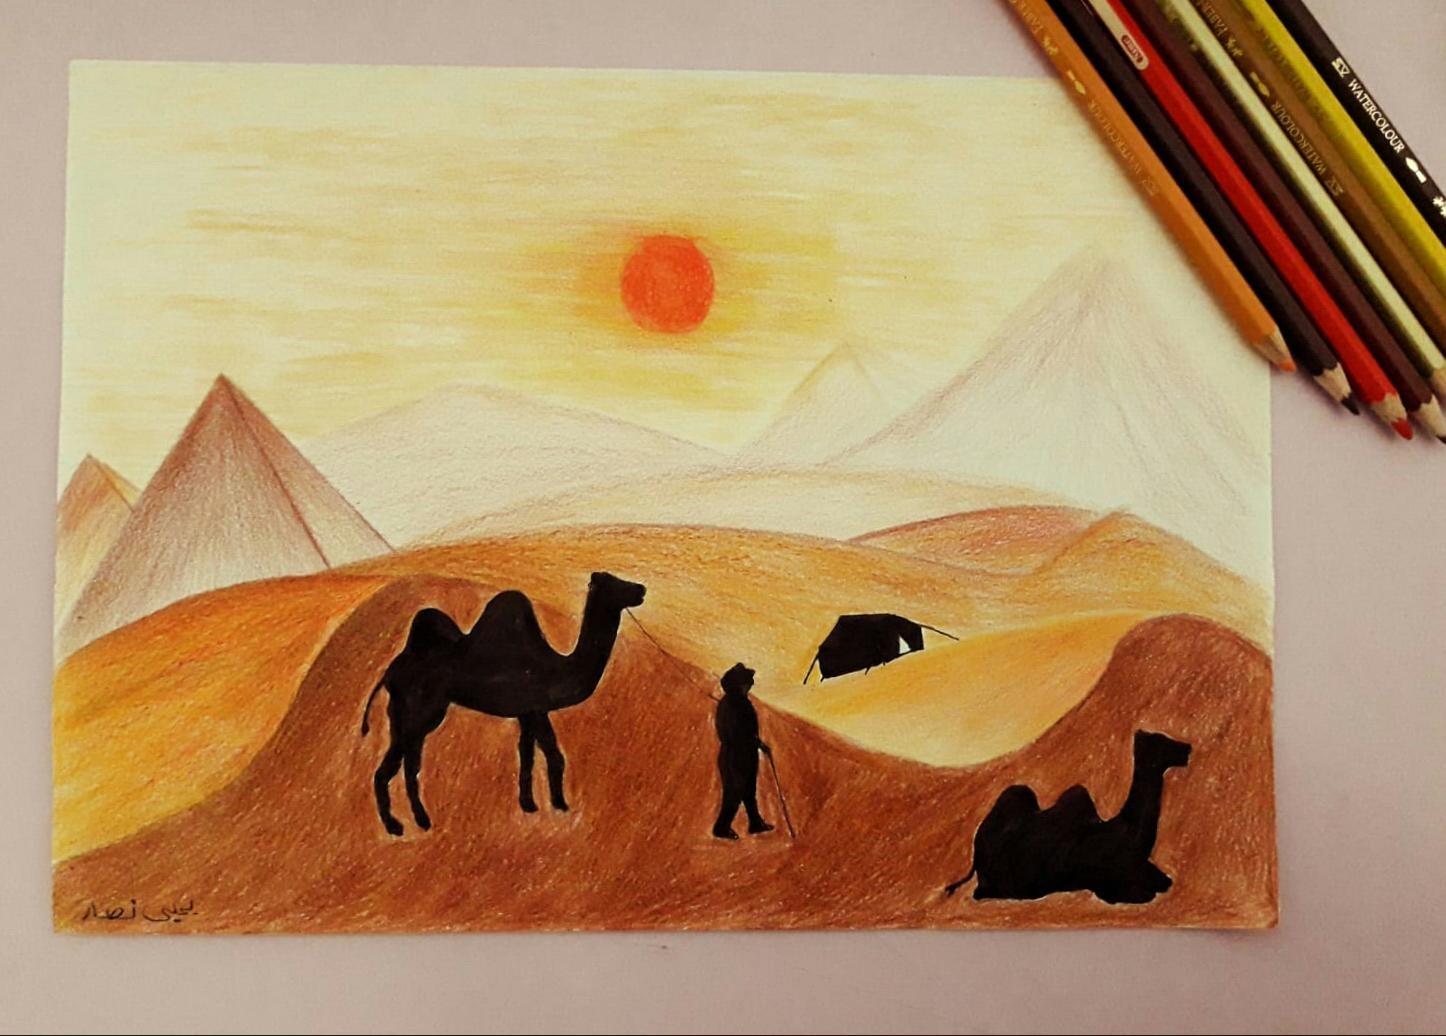 Wildlife in the Emirates by Muhammad Yahya Nassar